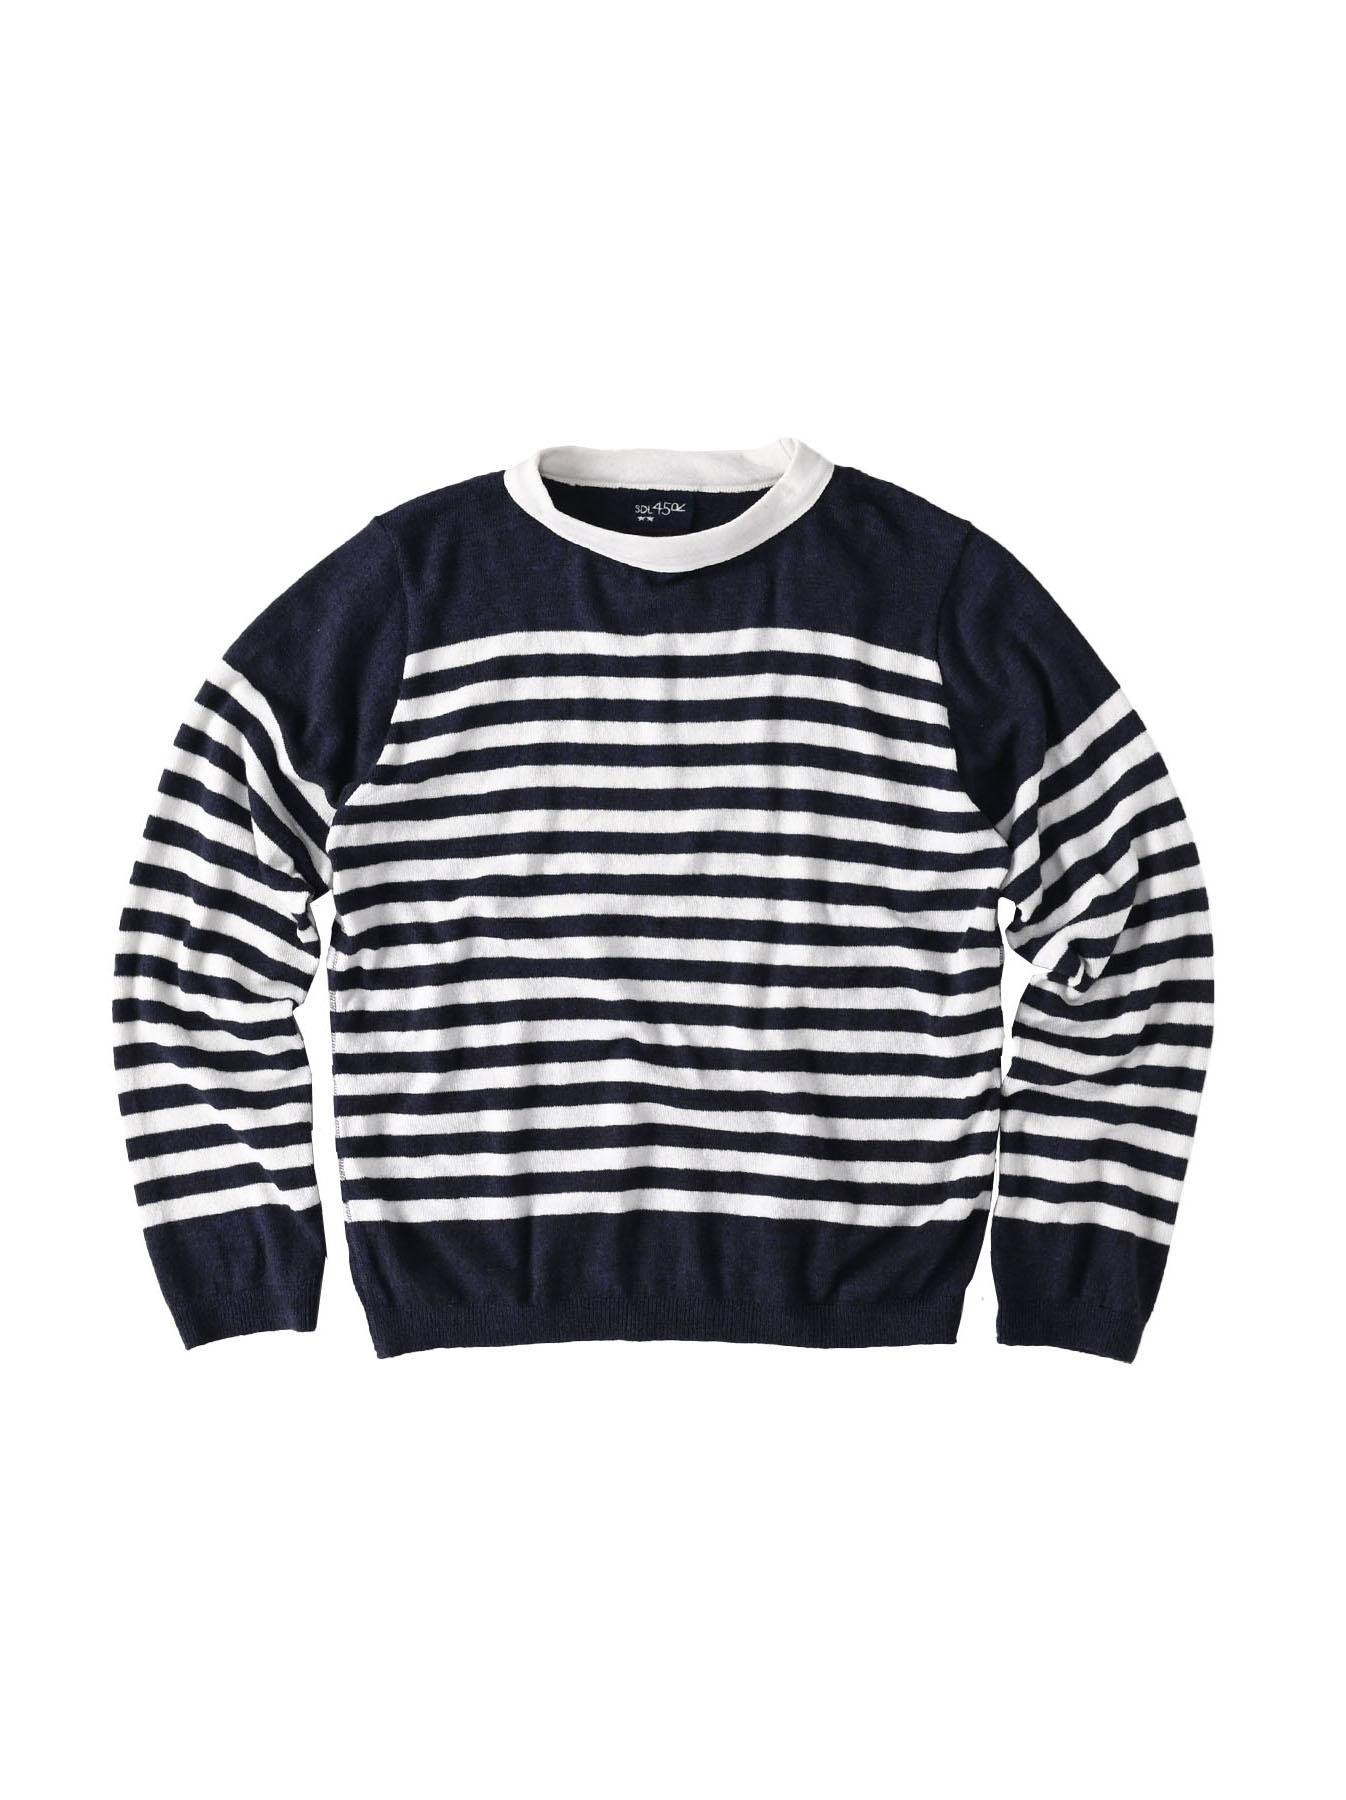 Super Gauze 908 Basque T-shirt Made in Japan (0621)-1